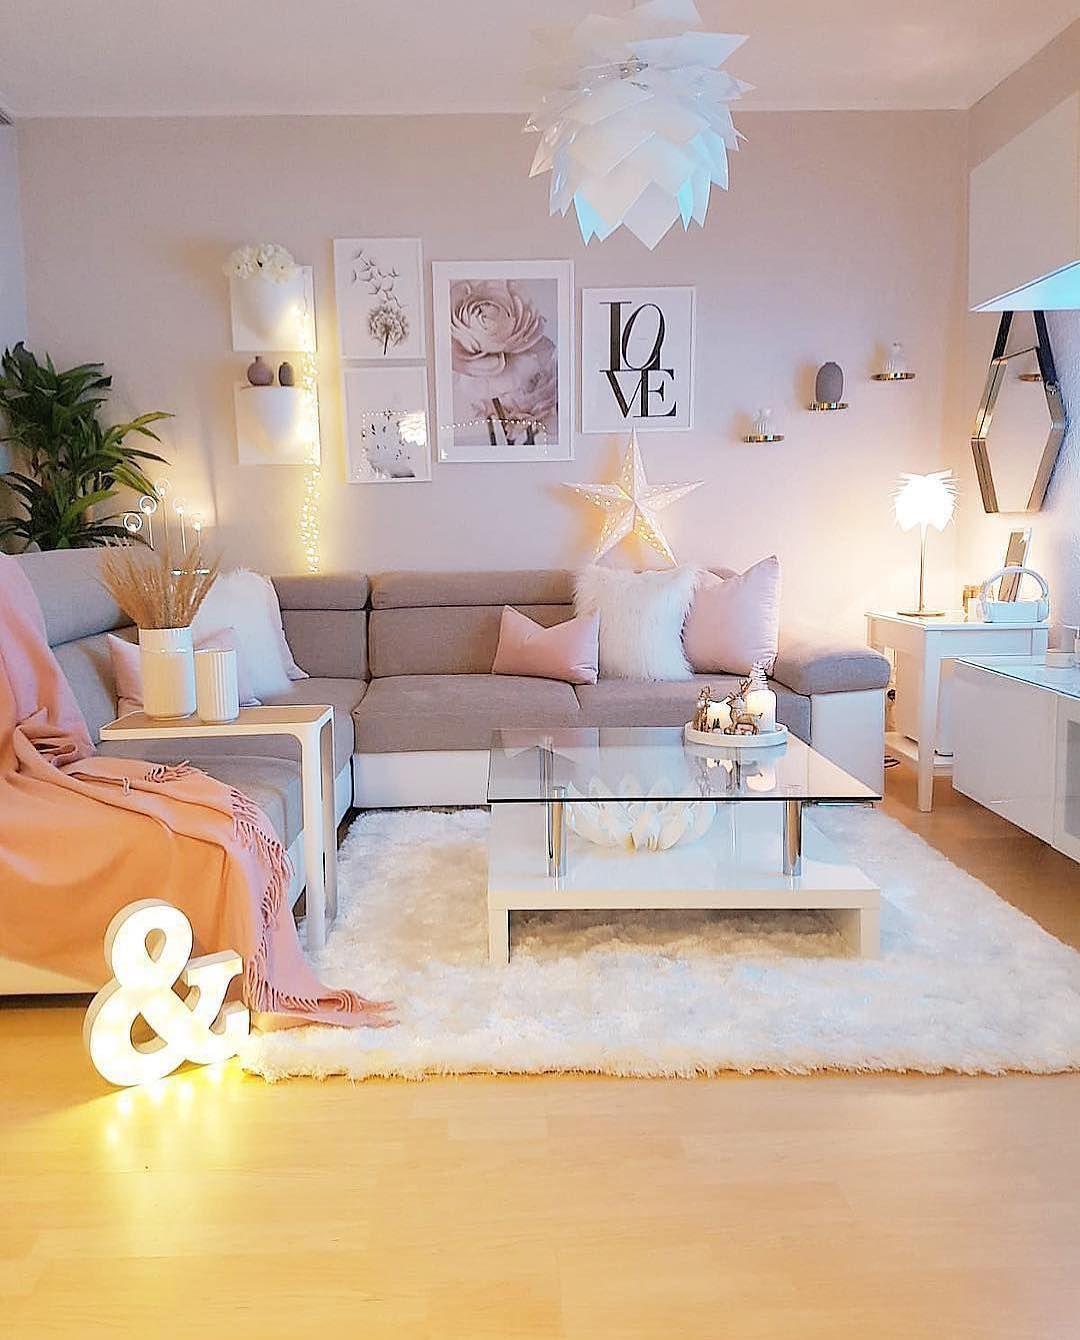 50 Cute Living Room Decor 2020 Cute Living Room Apartment Decorating Living Girly Living Room Well decorated living rooms